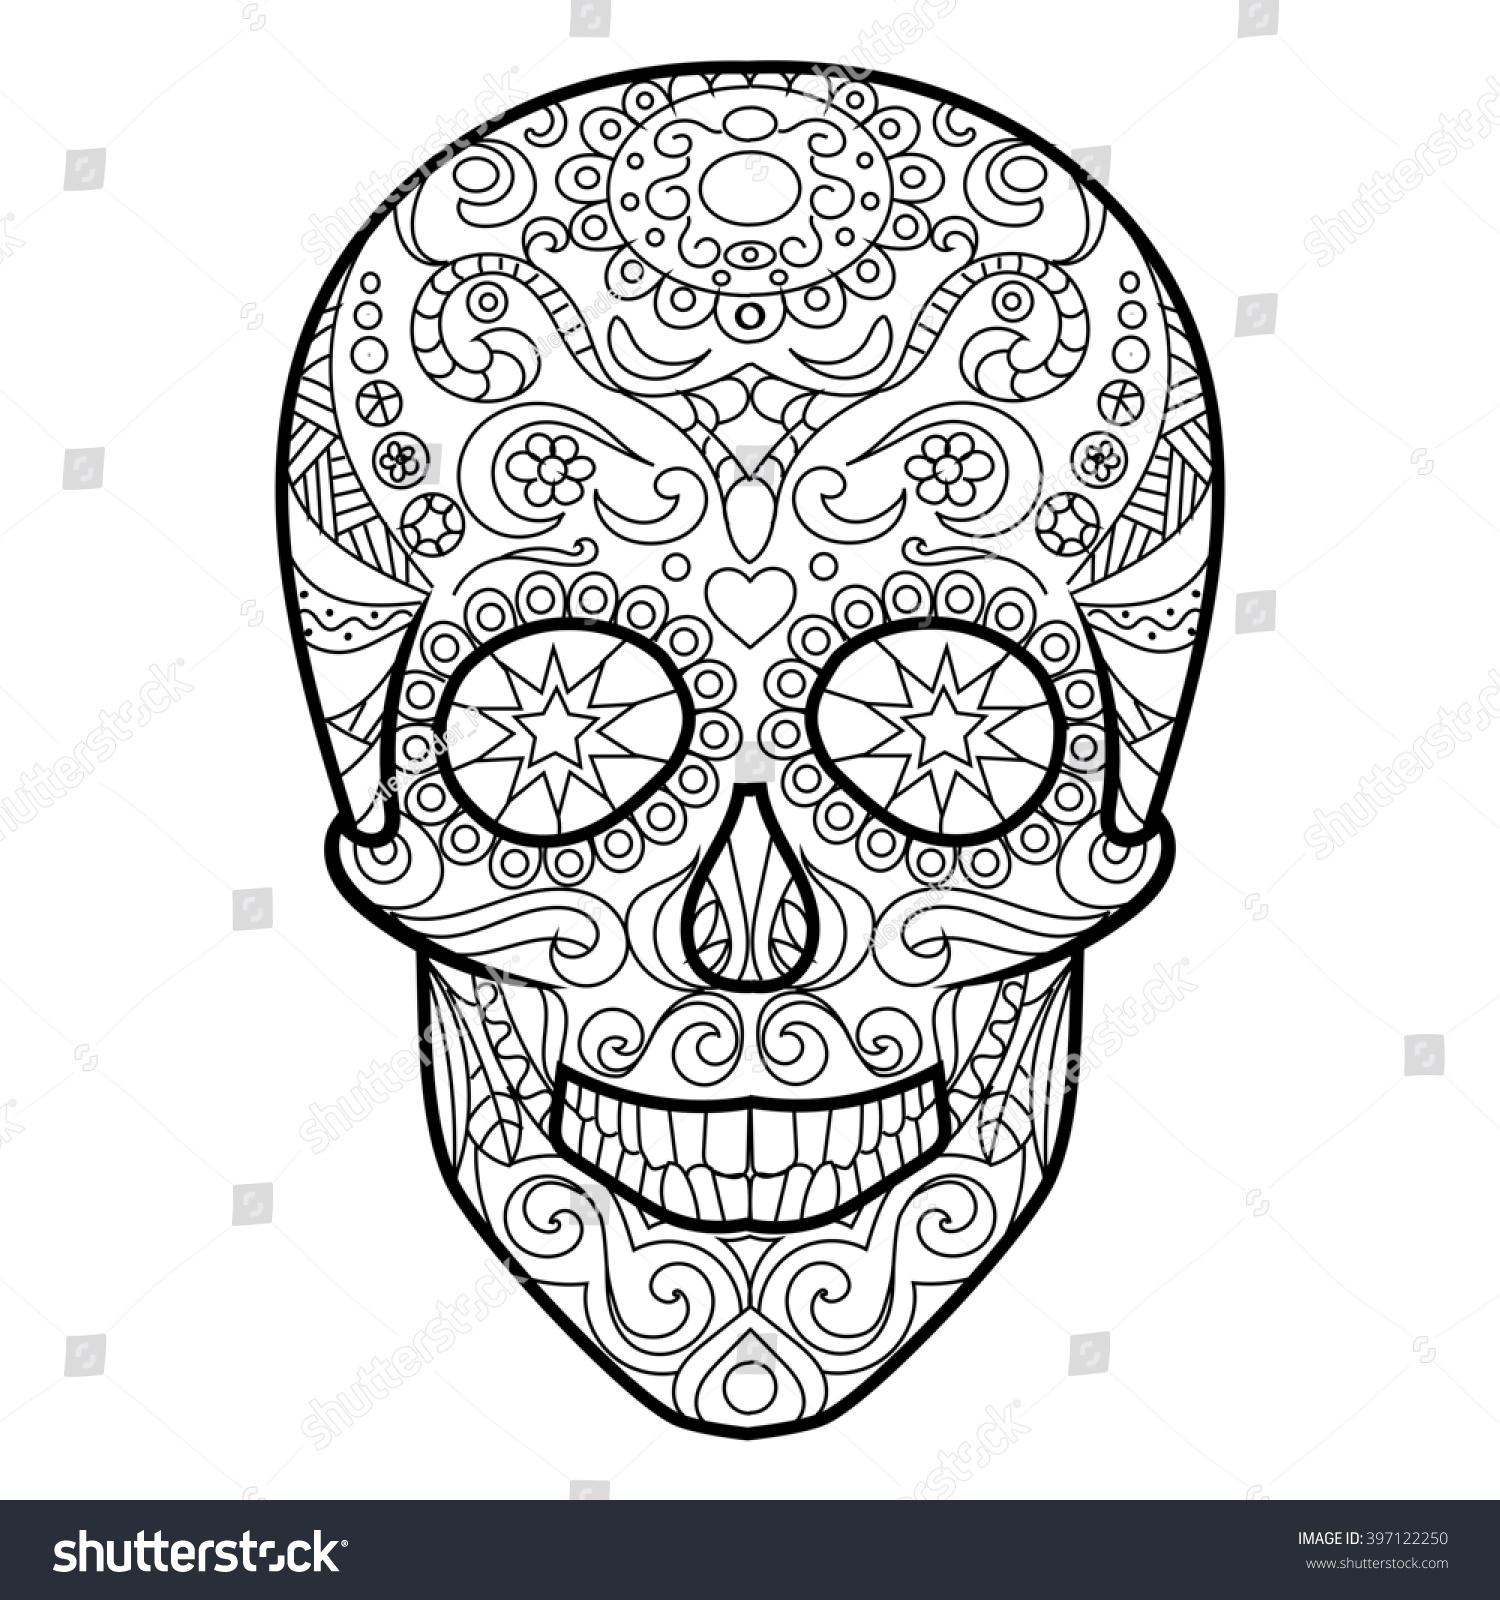 hunan skull coloring book adults raster stock illustration - Cinco De Mayo Skull Coloring Pages